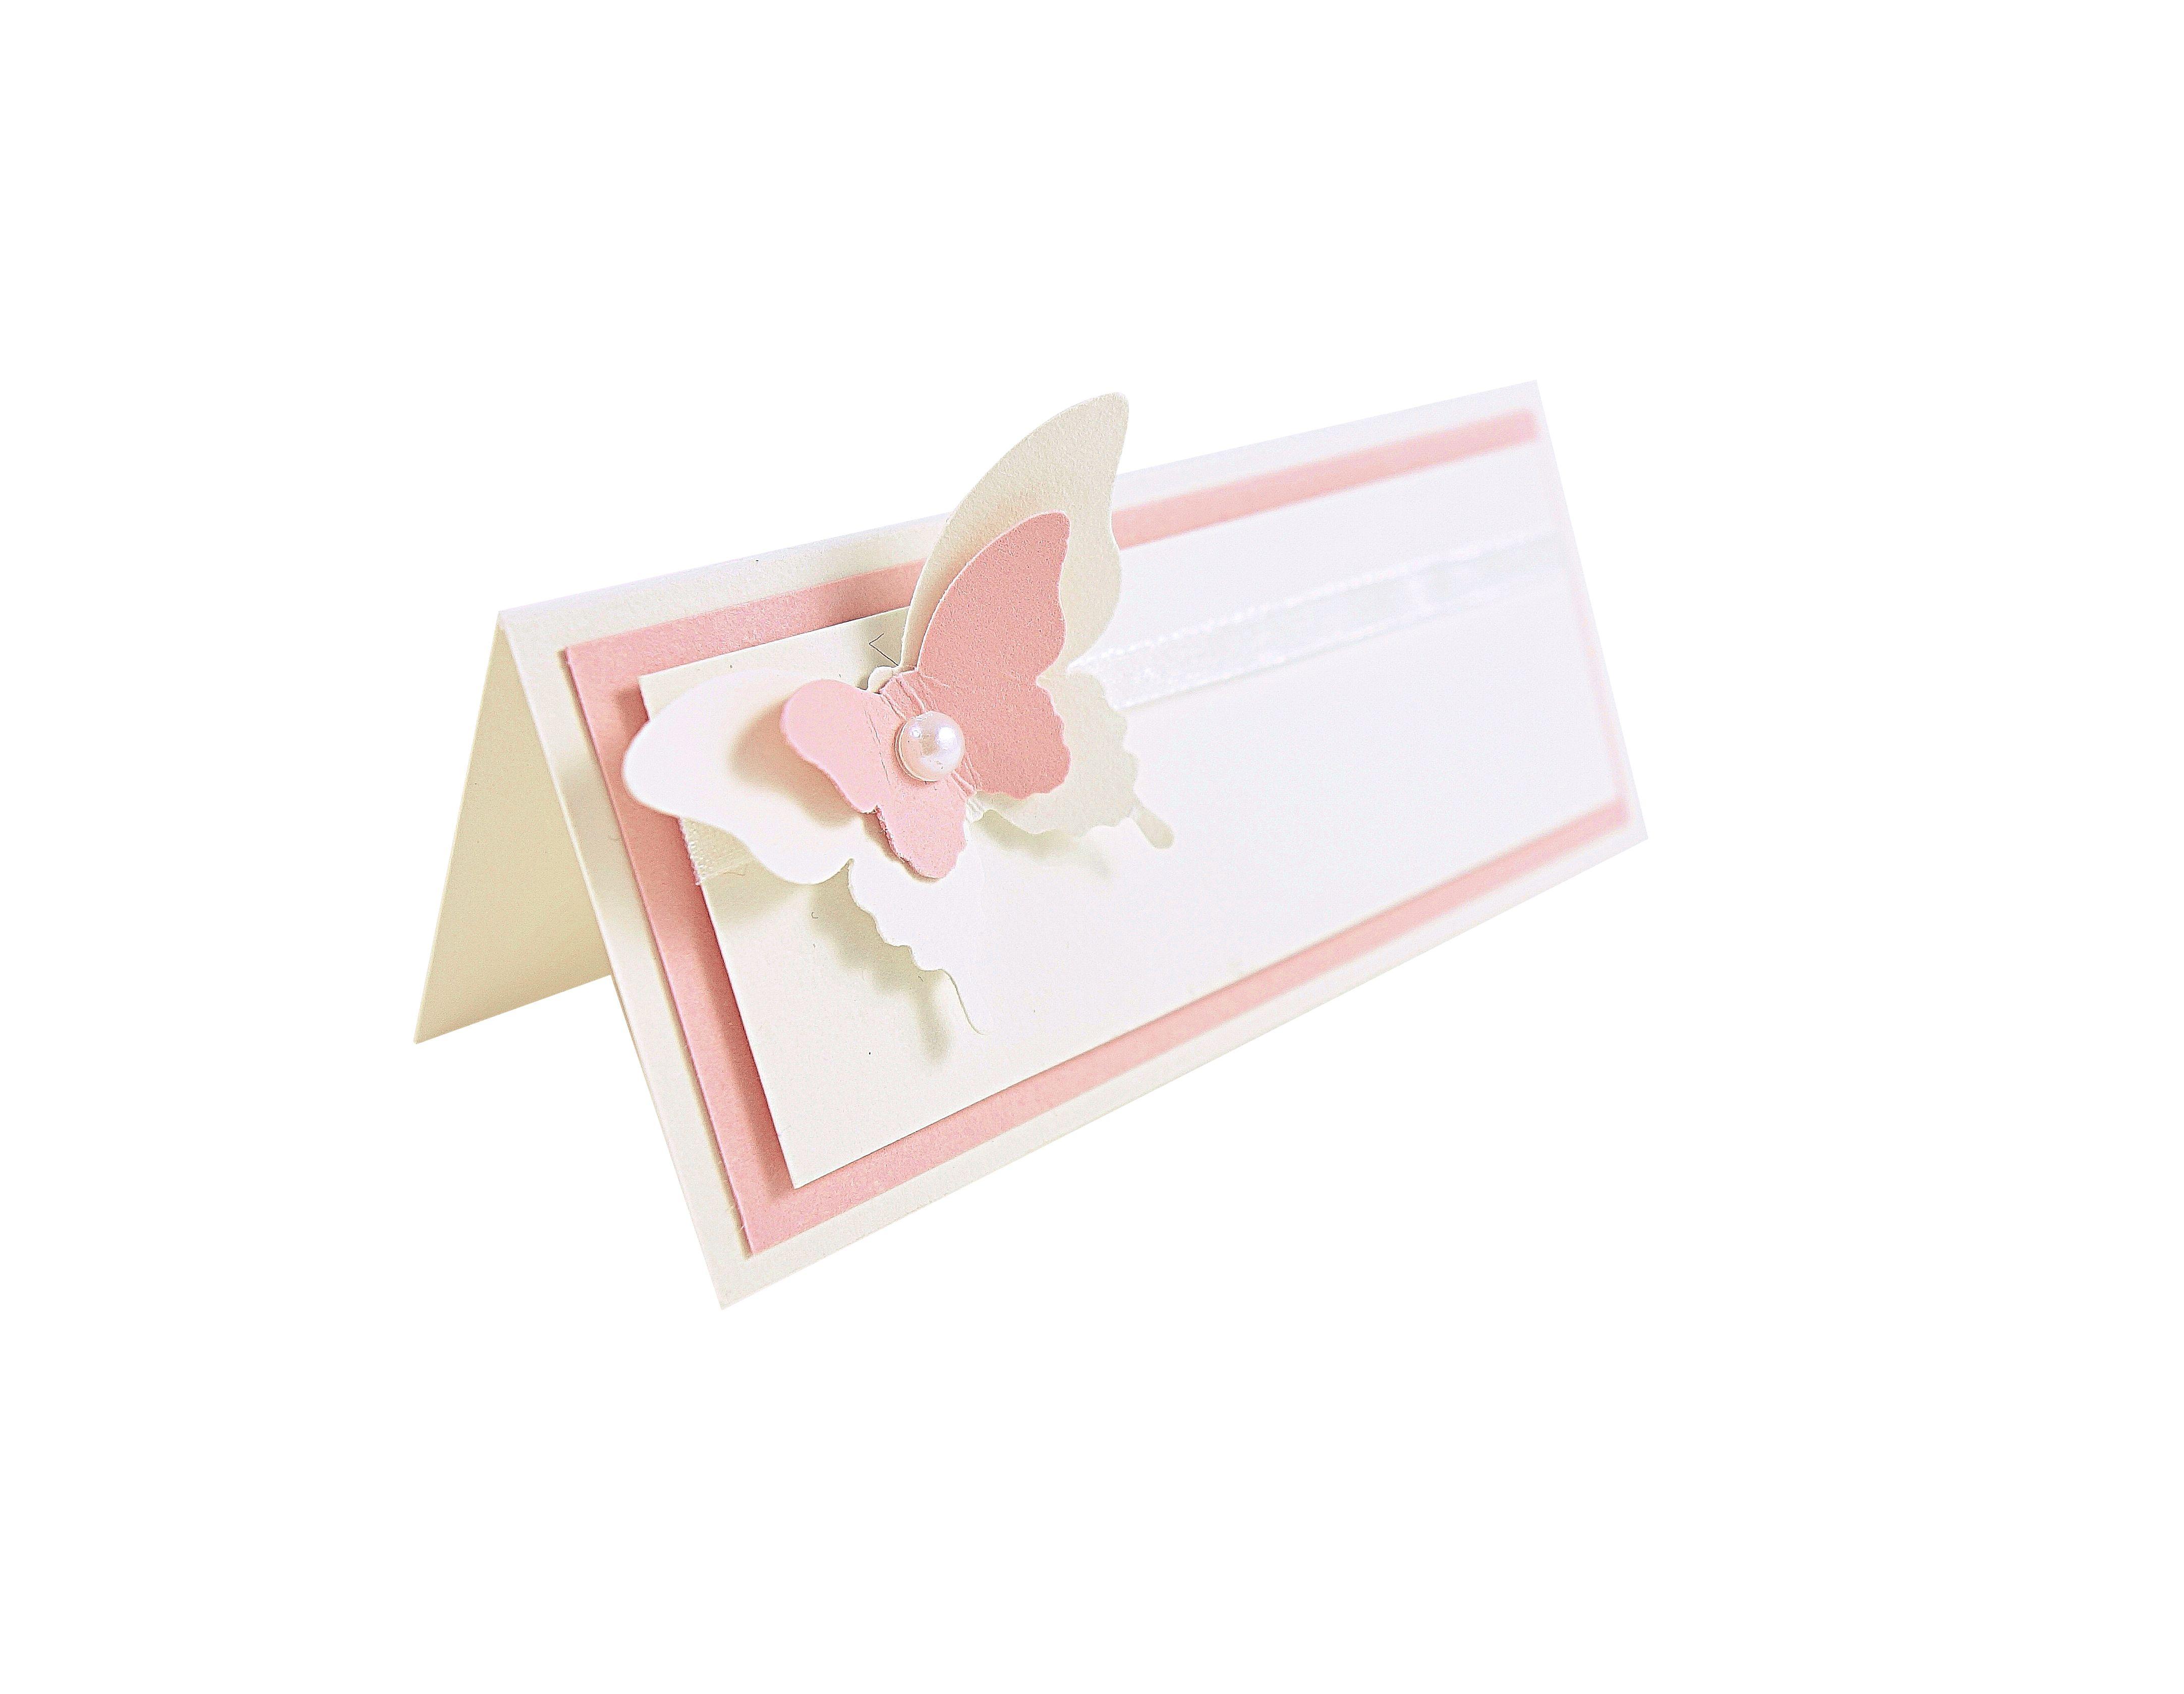 10 Stück Platzkarte Zartrosa Tischkarte Tischkarte 10,0 x 4,5 cm